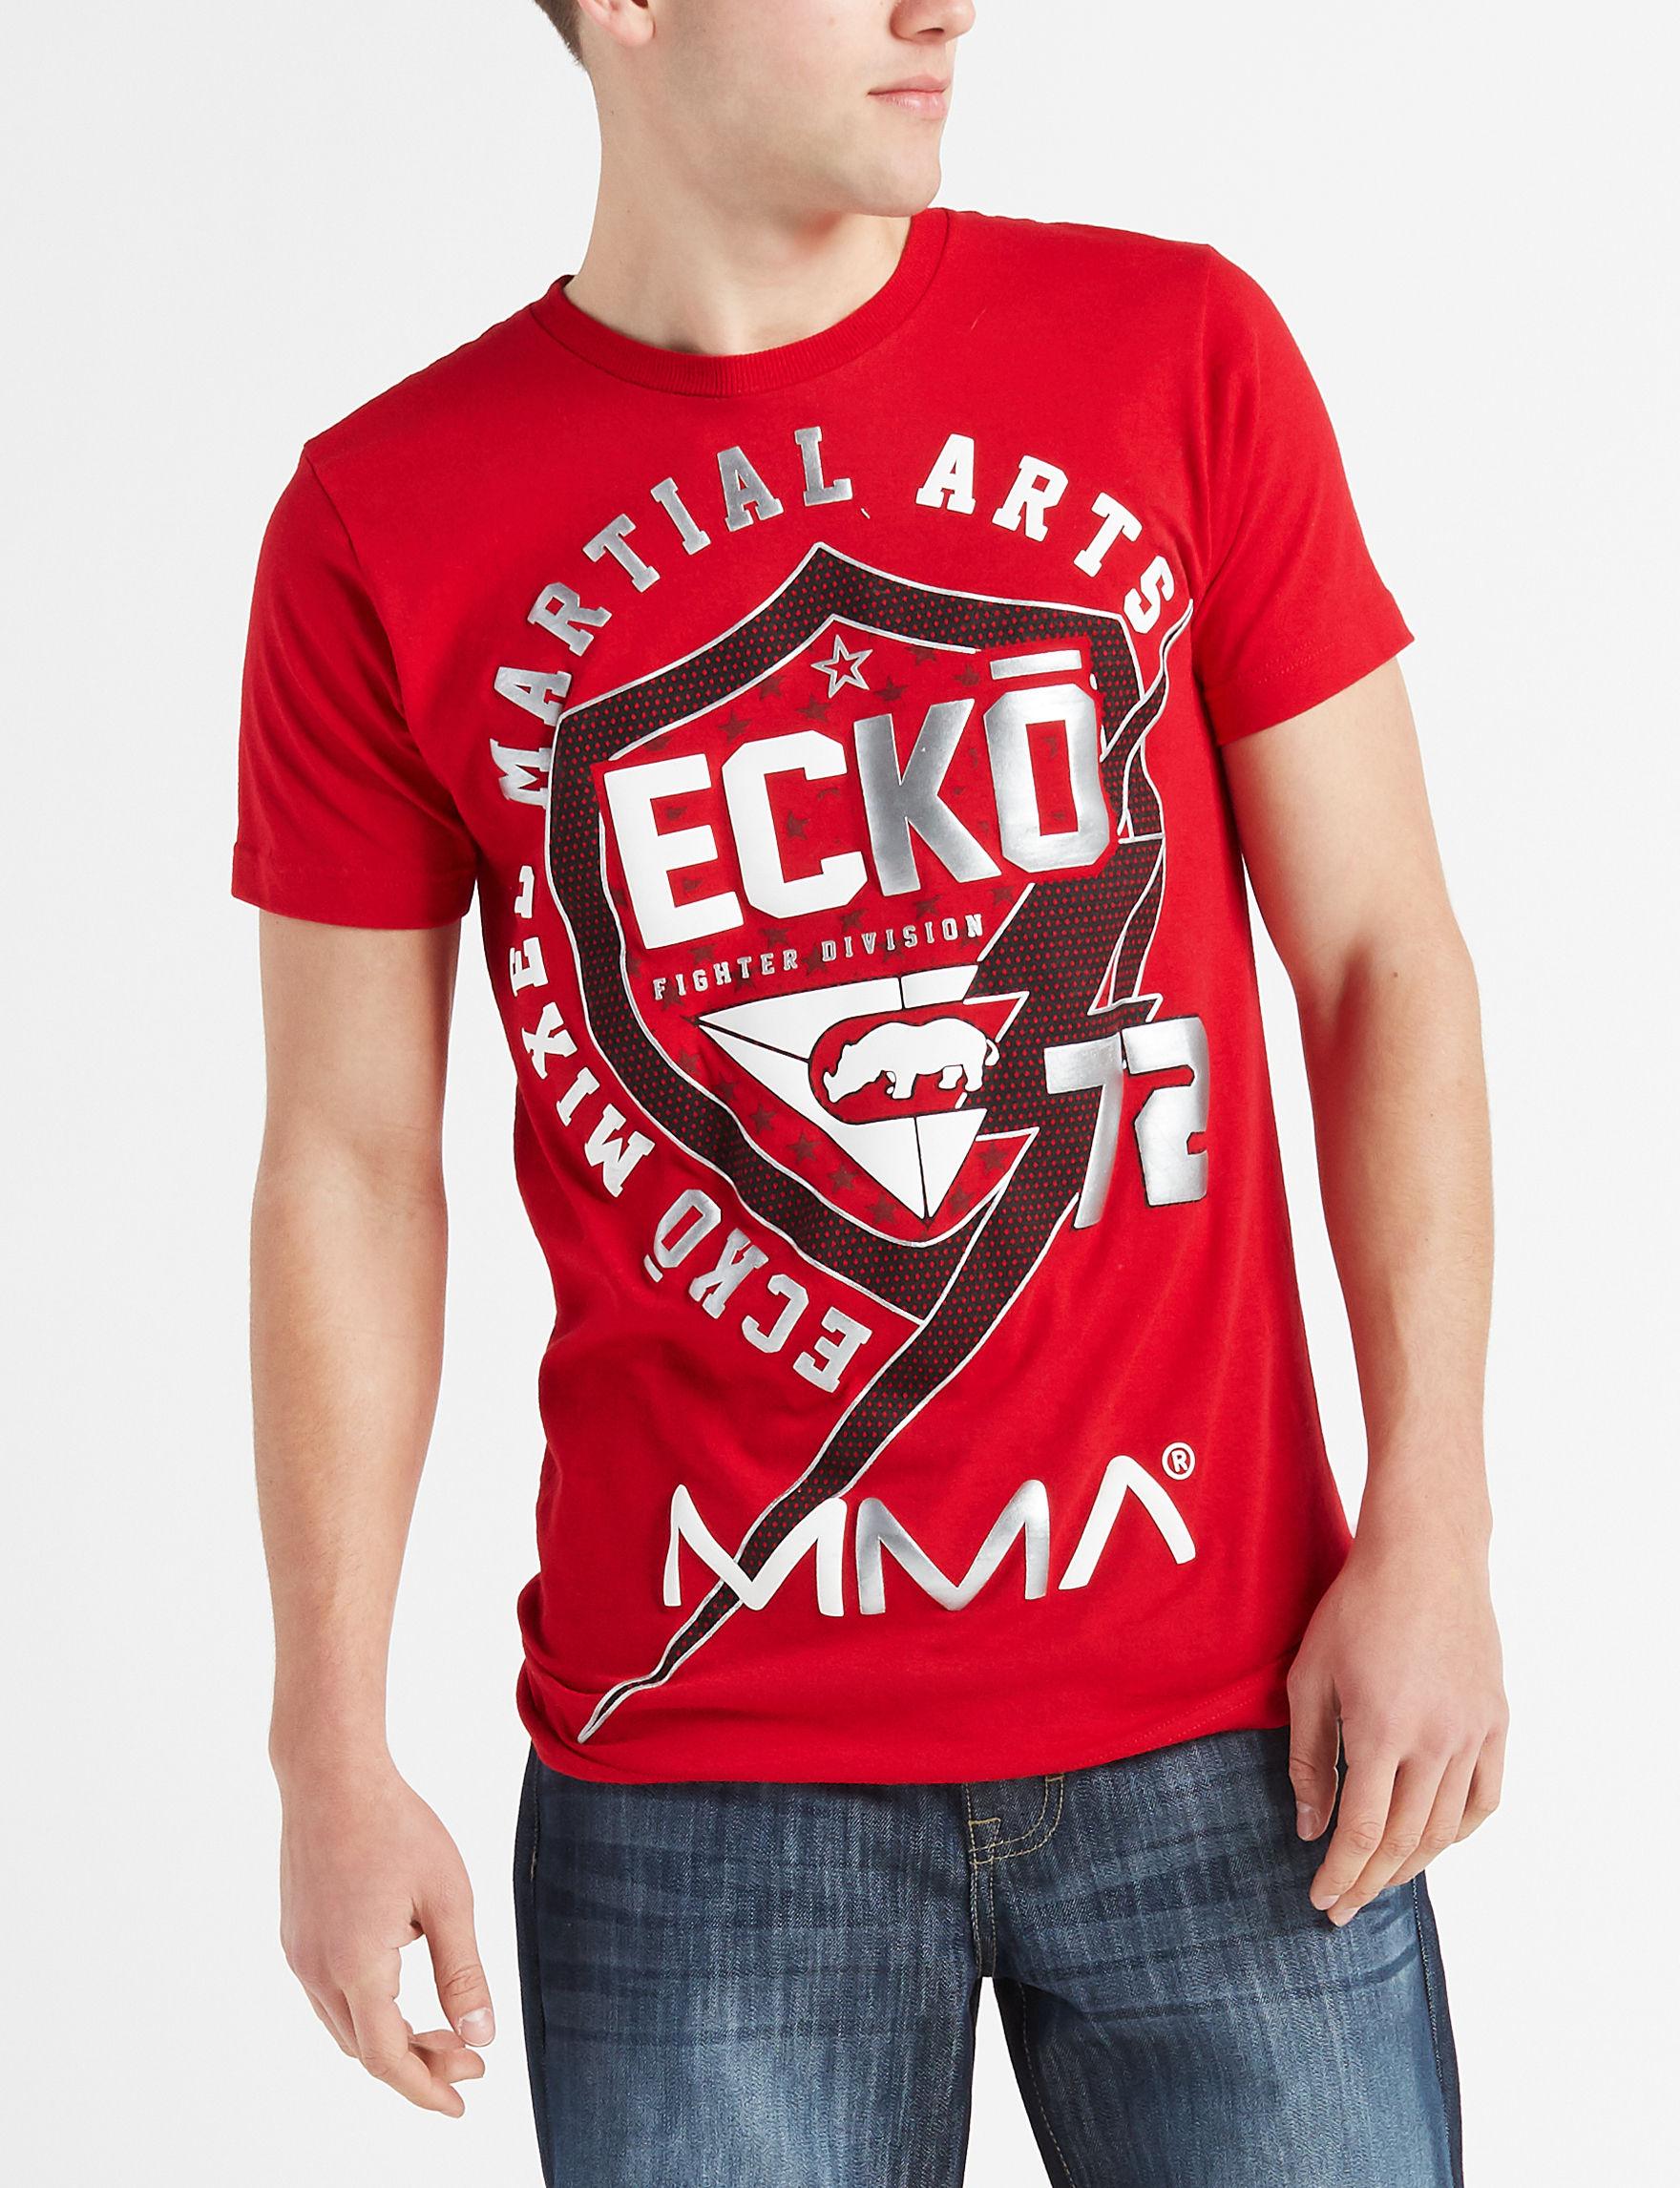 Ecko Red / Black / White Tees & Tanks